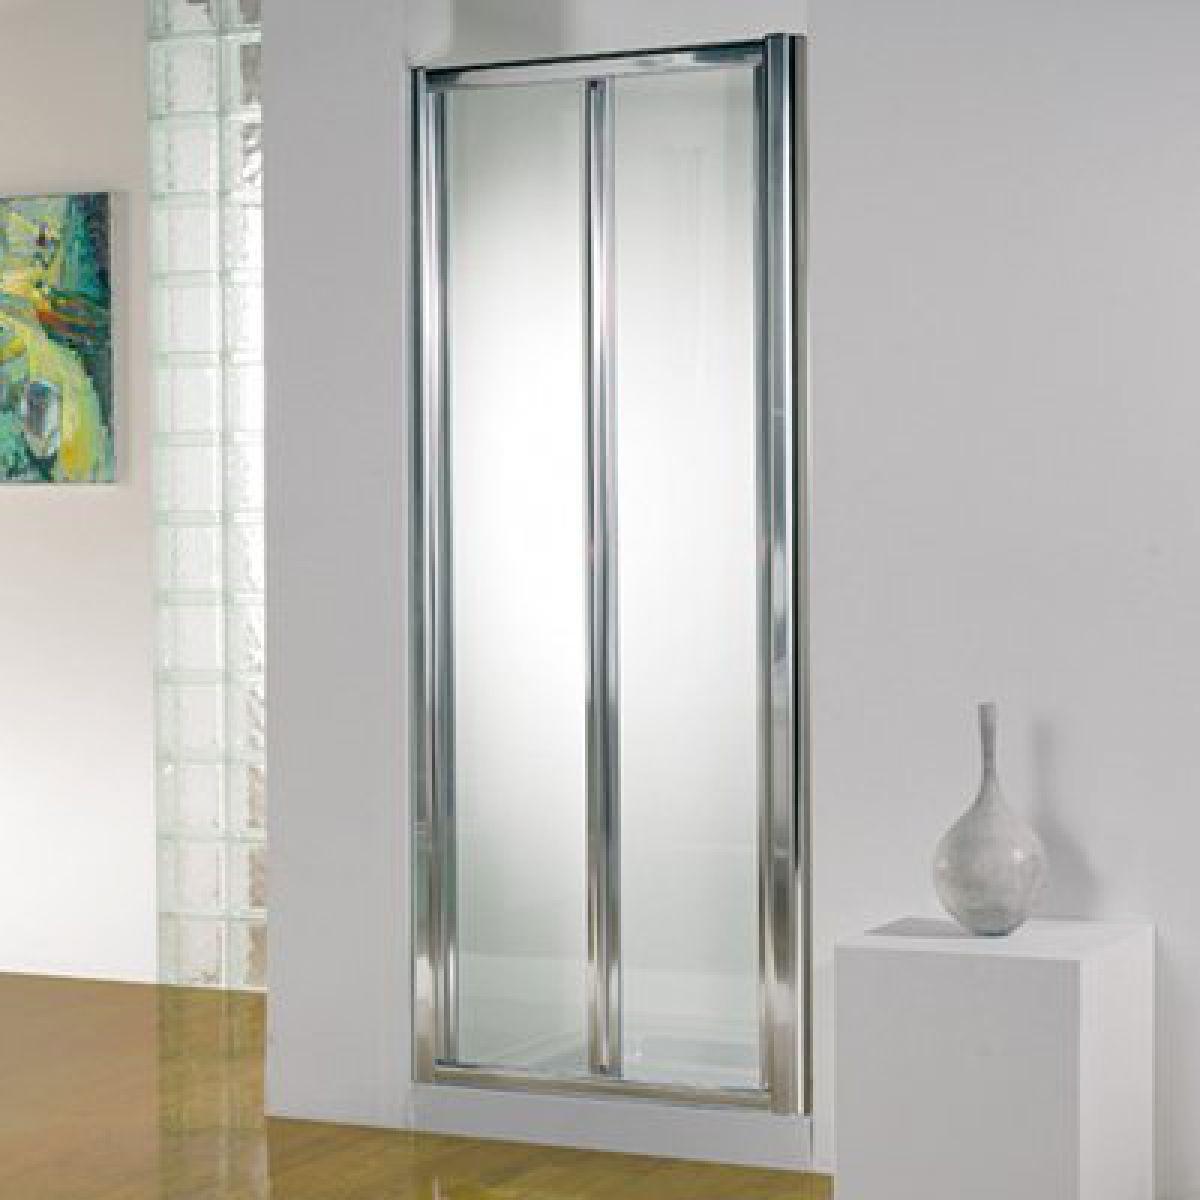 Bi fold shower door will give your bathroom an upscale look bath - 12004147194852441200 Home Shower Enclosures Bi Fold Shower Doors 837141 Bathroom Bi Fold Door 12001200 Save